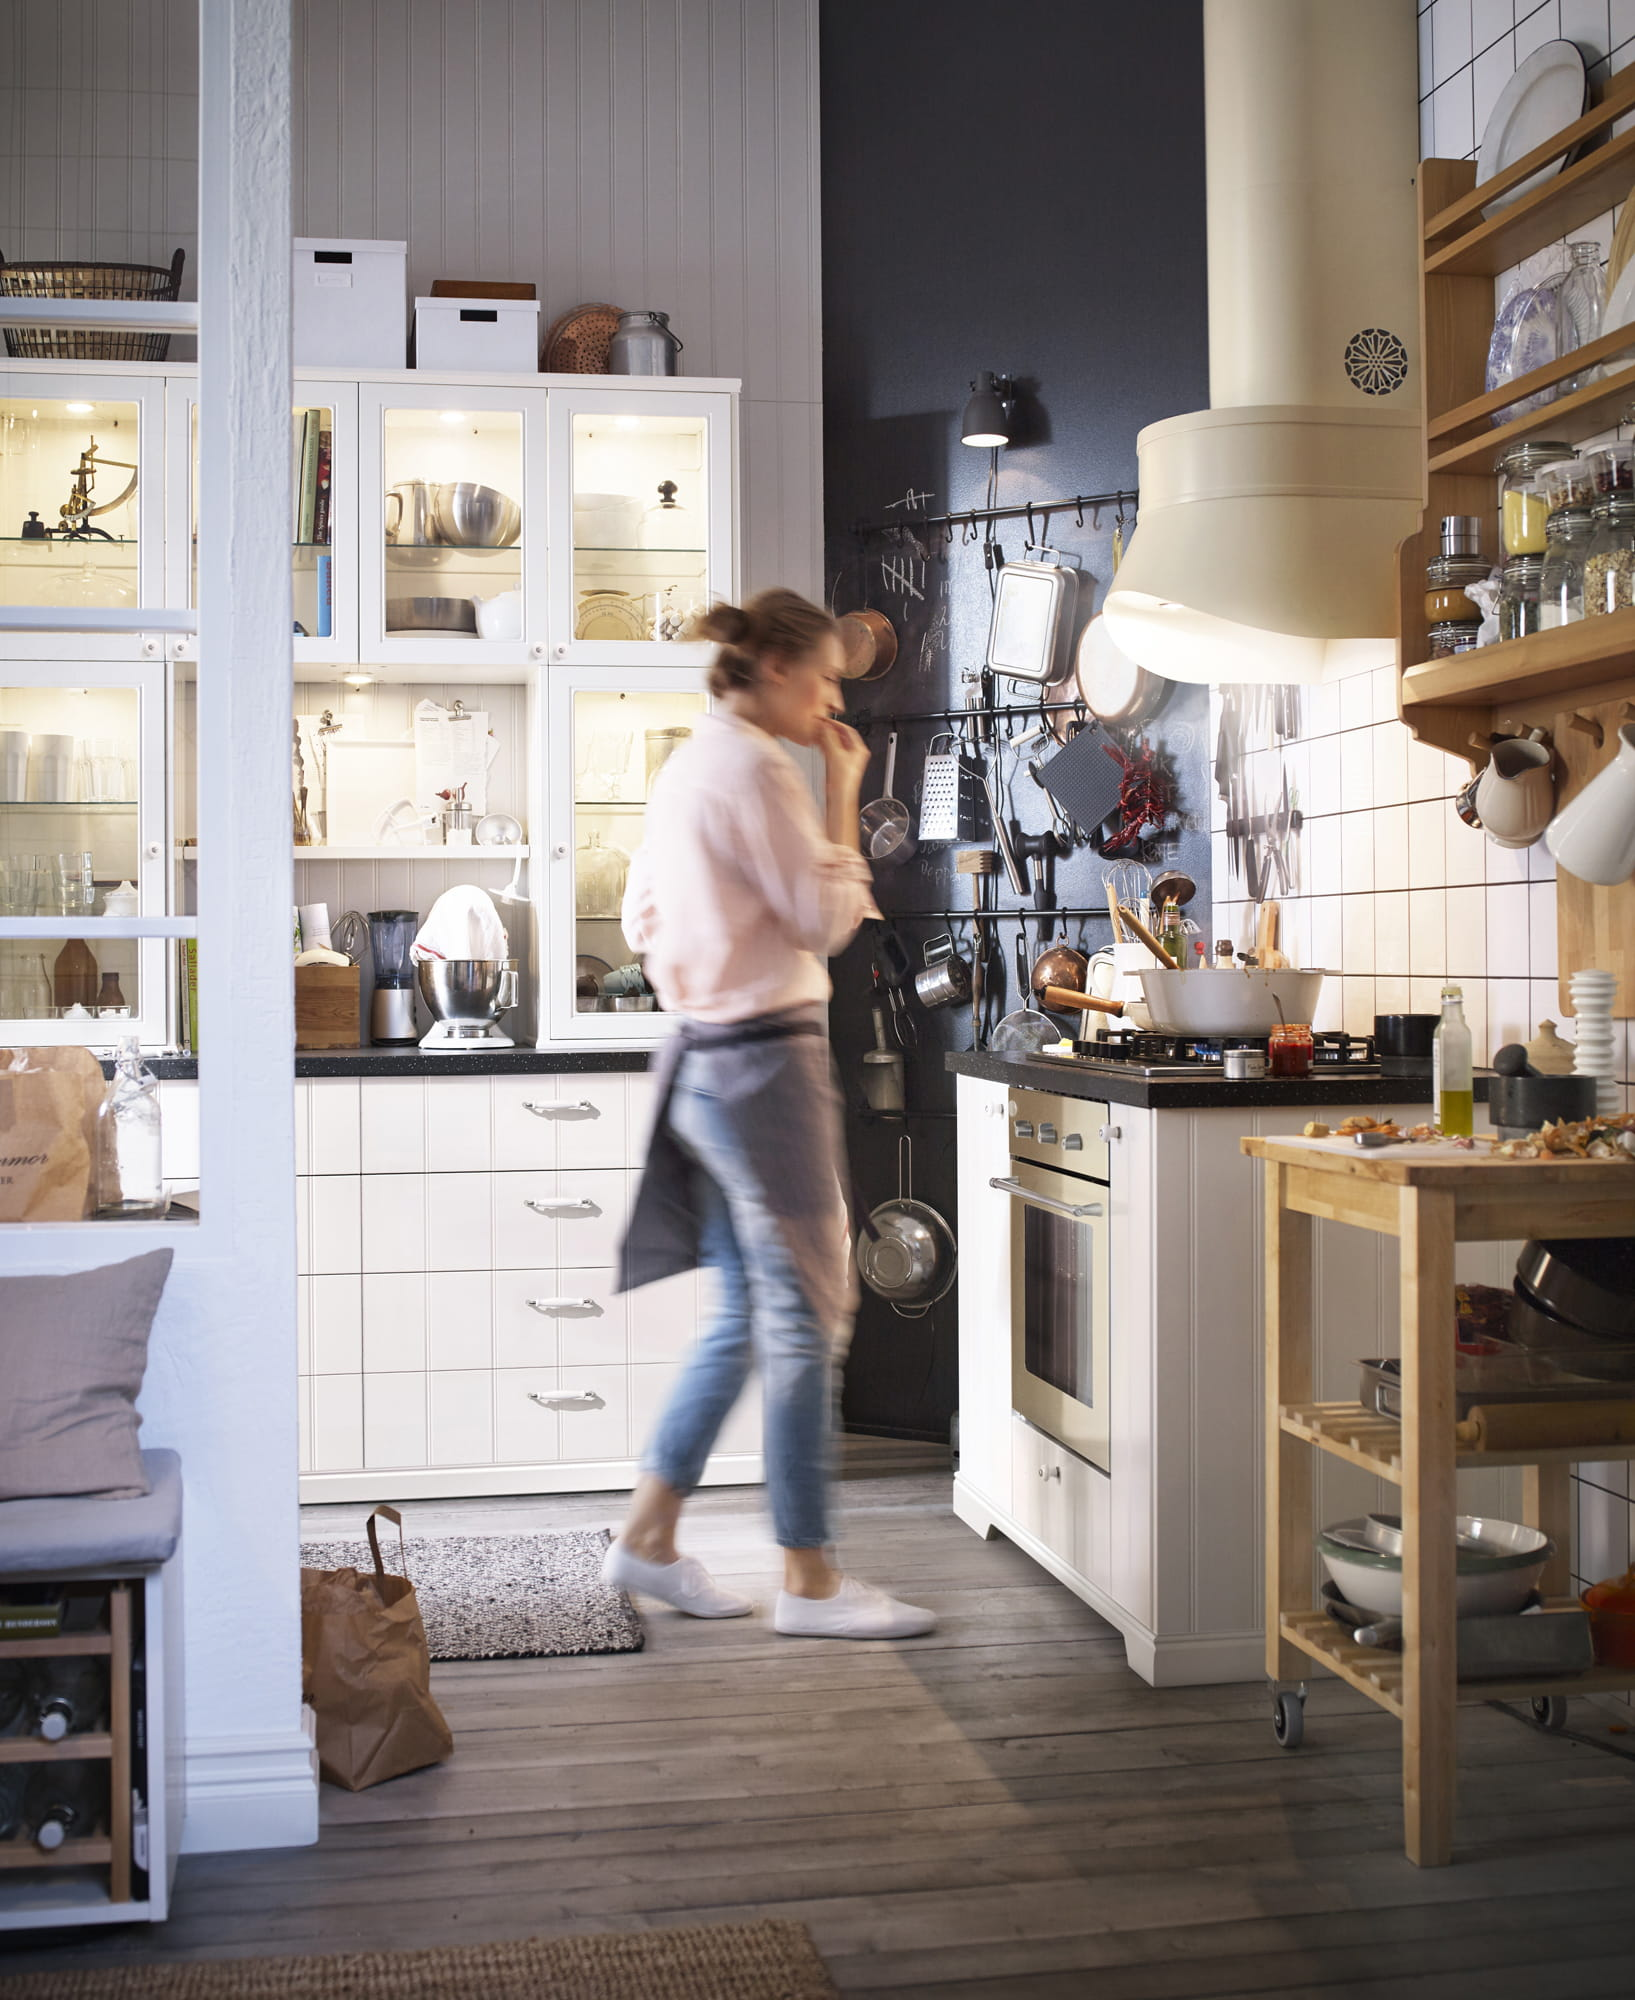 la cuisine metod hittarp d 39 ikea la cuisine ikea 2016 dans un style scandinave journal des femmes. Black Bedroom Furniture Sets. Home Design Ideas